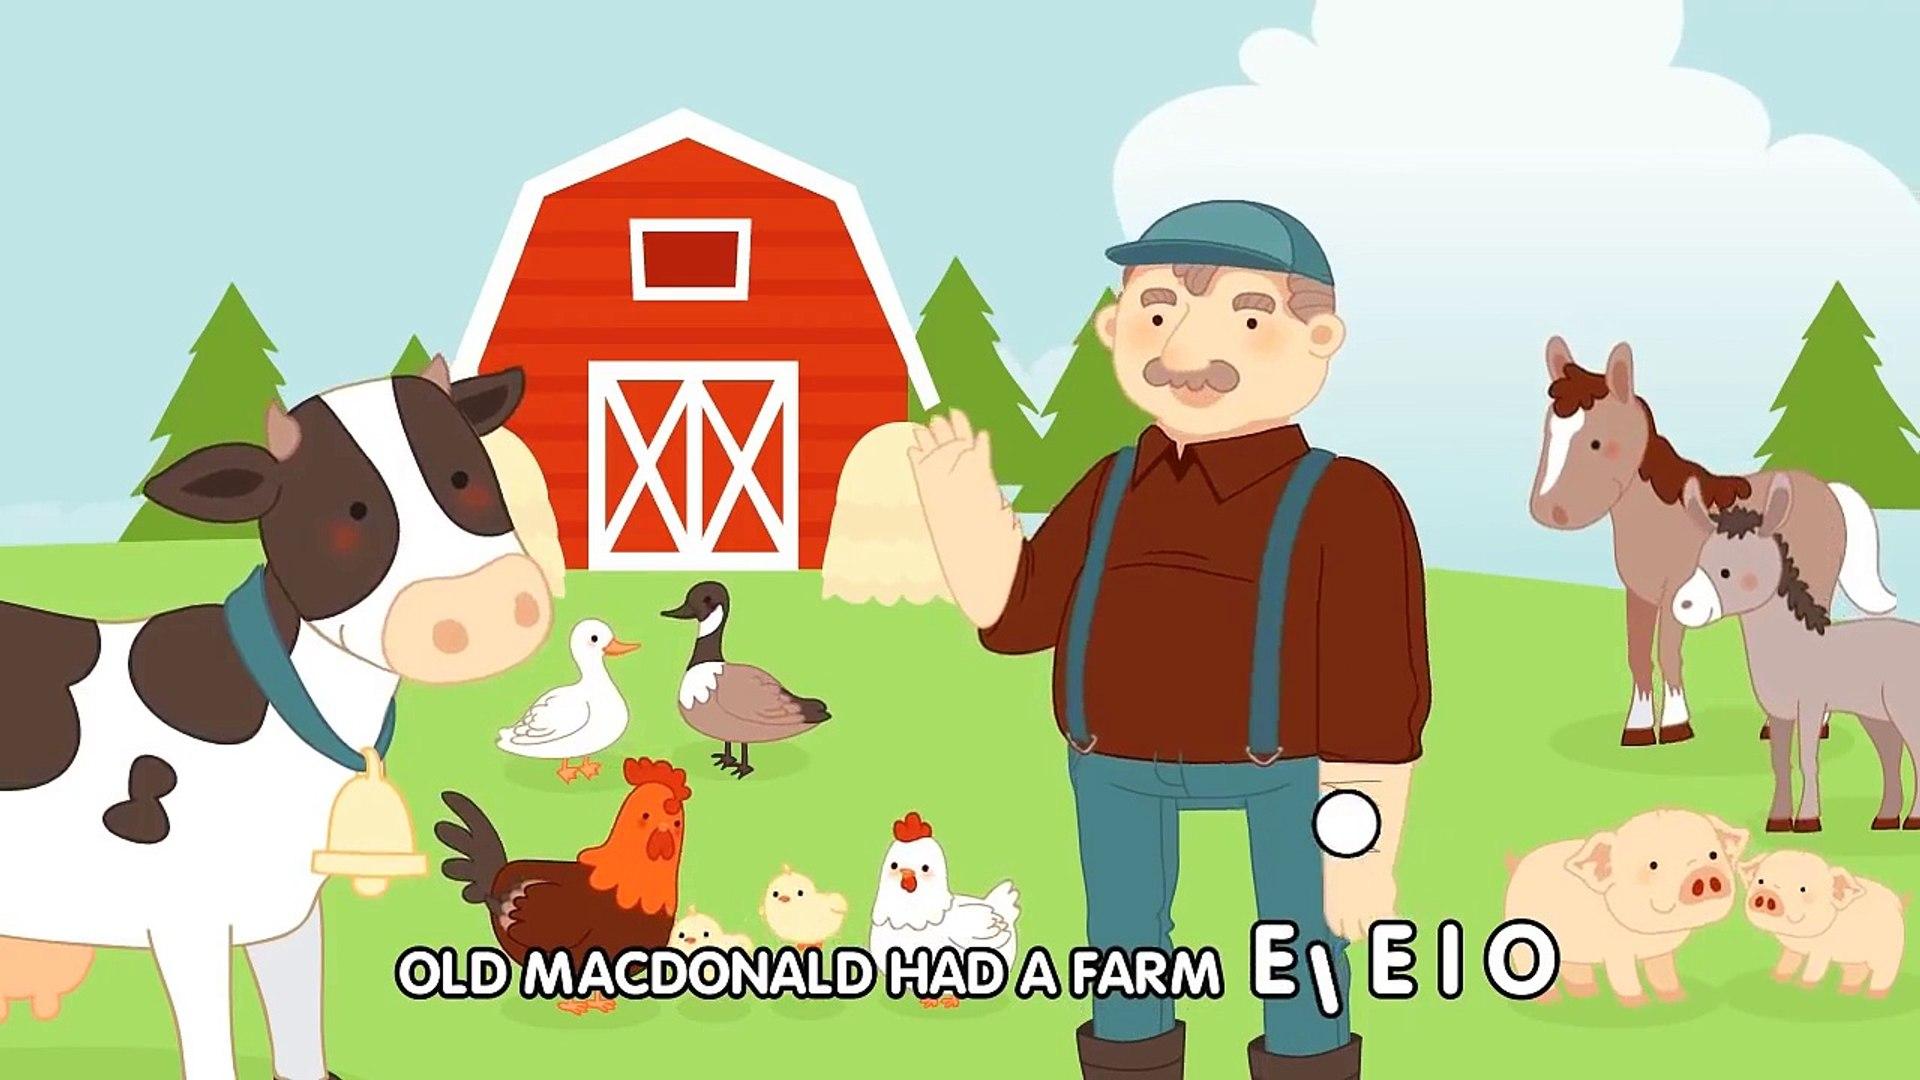 Old Macdonald Had A Farm Nursery Rhymes Song With Lyrics Animated Cartoon For Kids Video Dailymotion